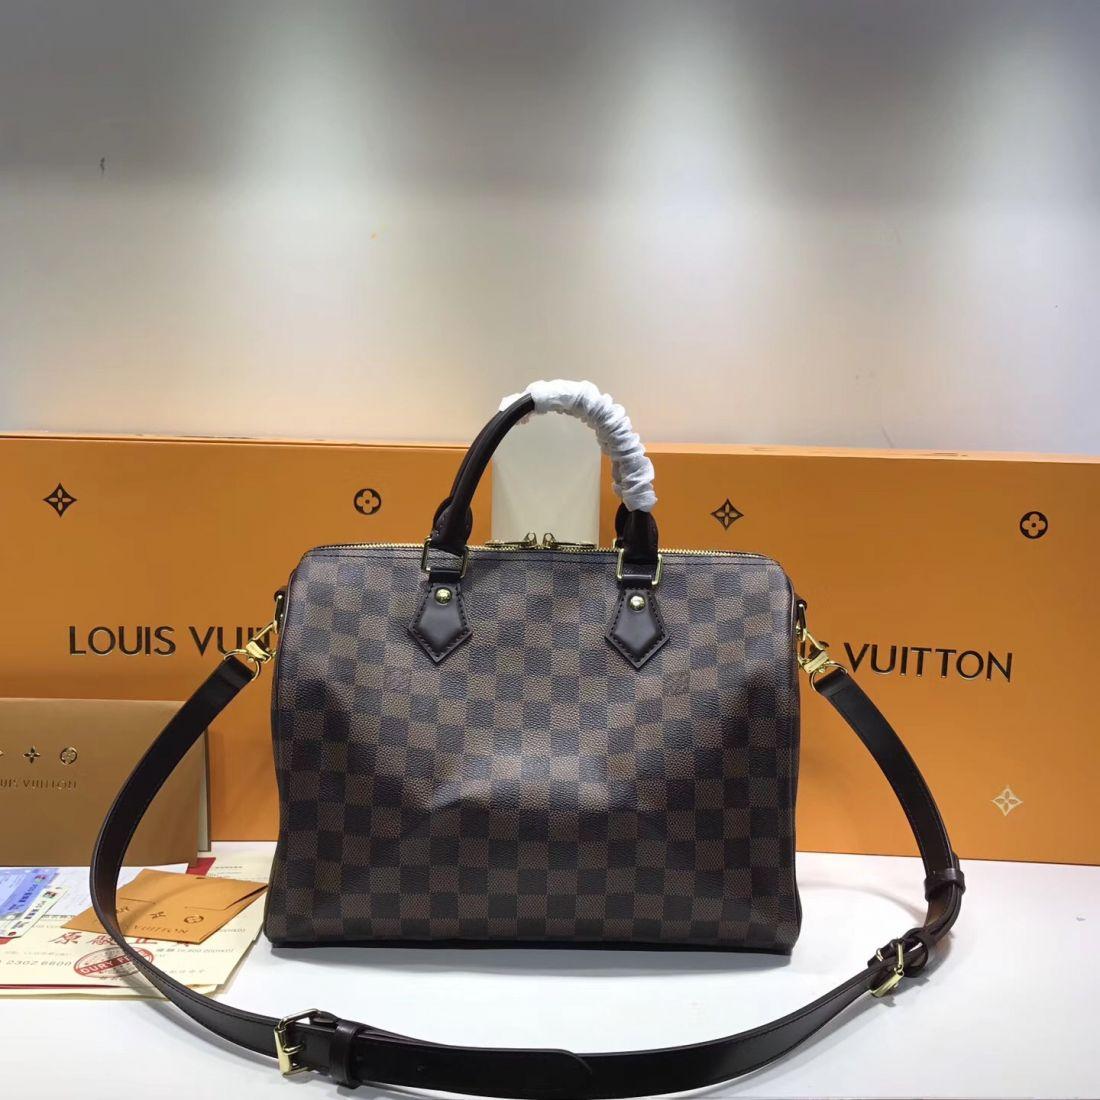 Сумка Louis Vuitton Speedy 30 Damier Ebene